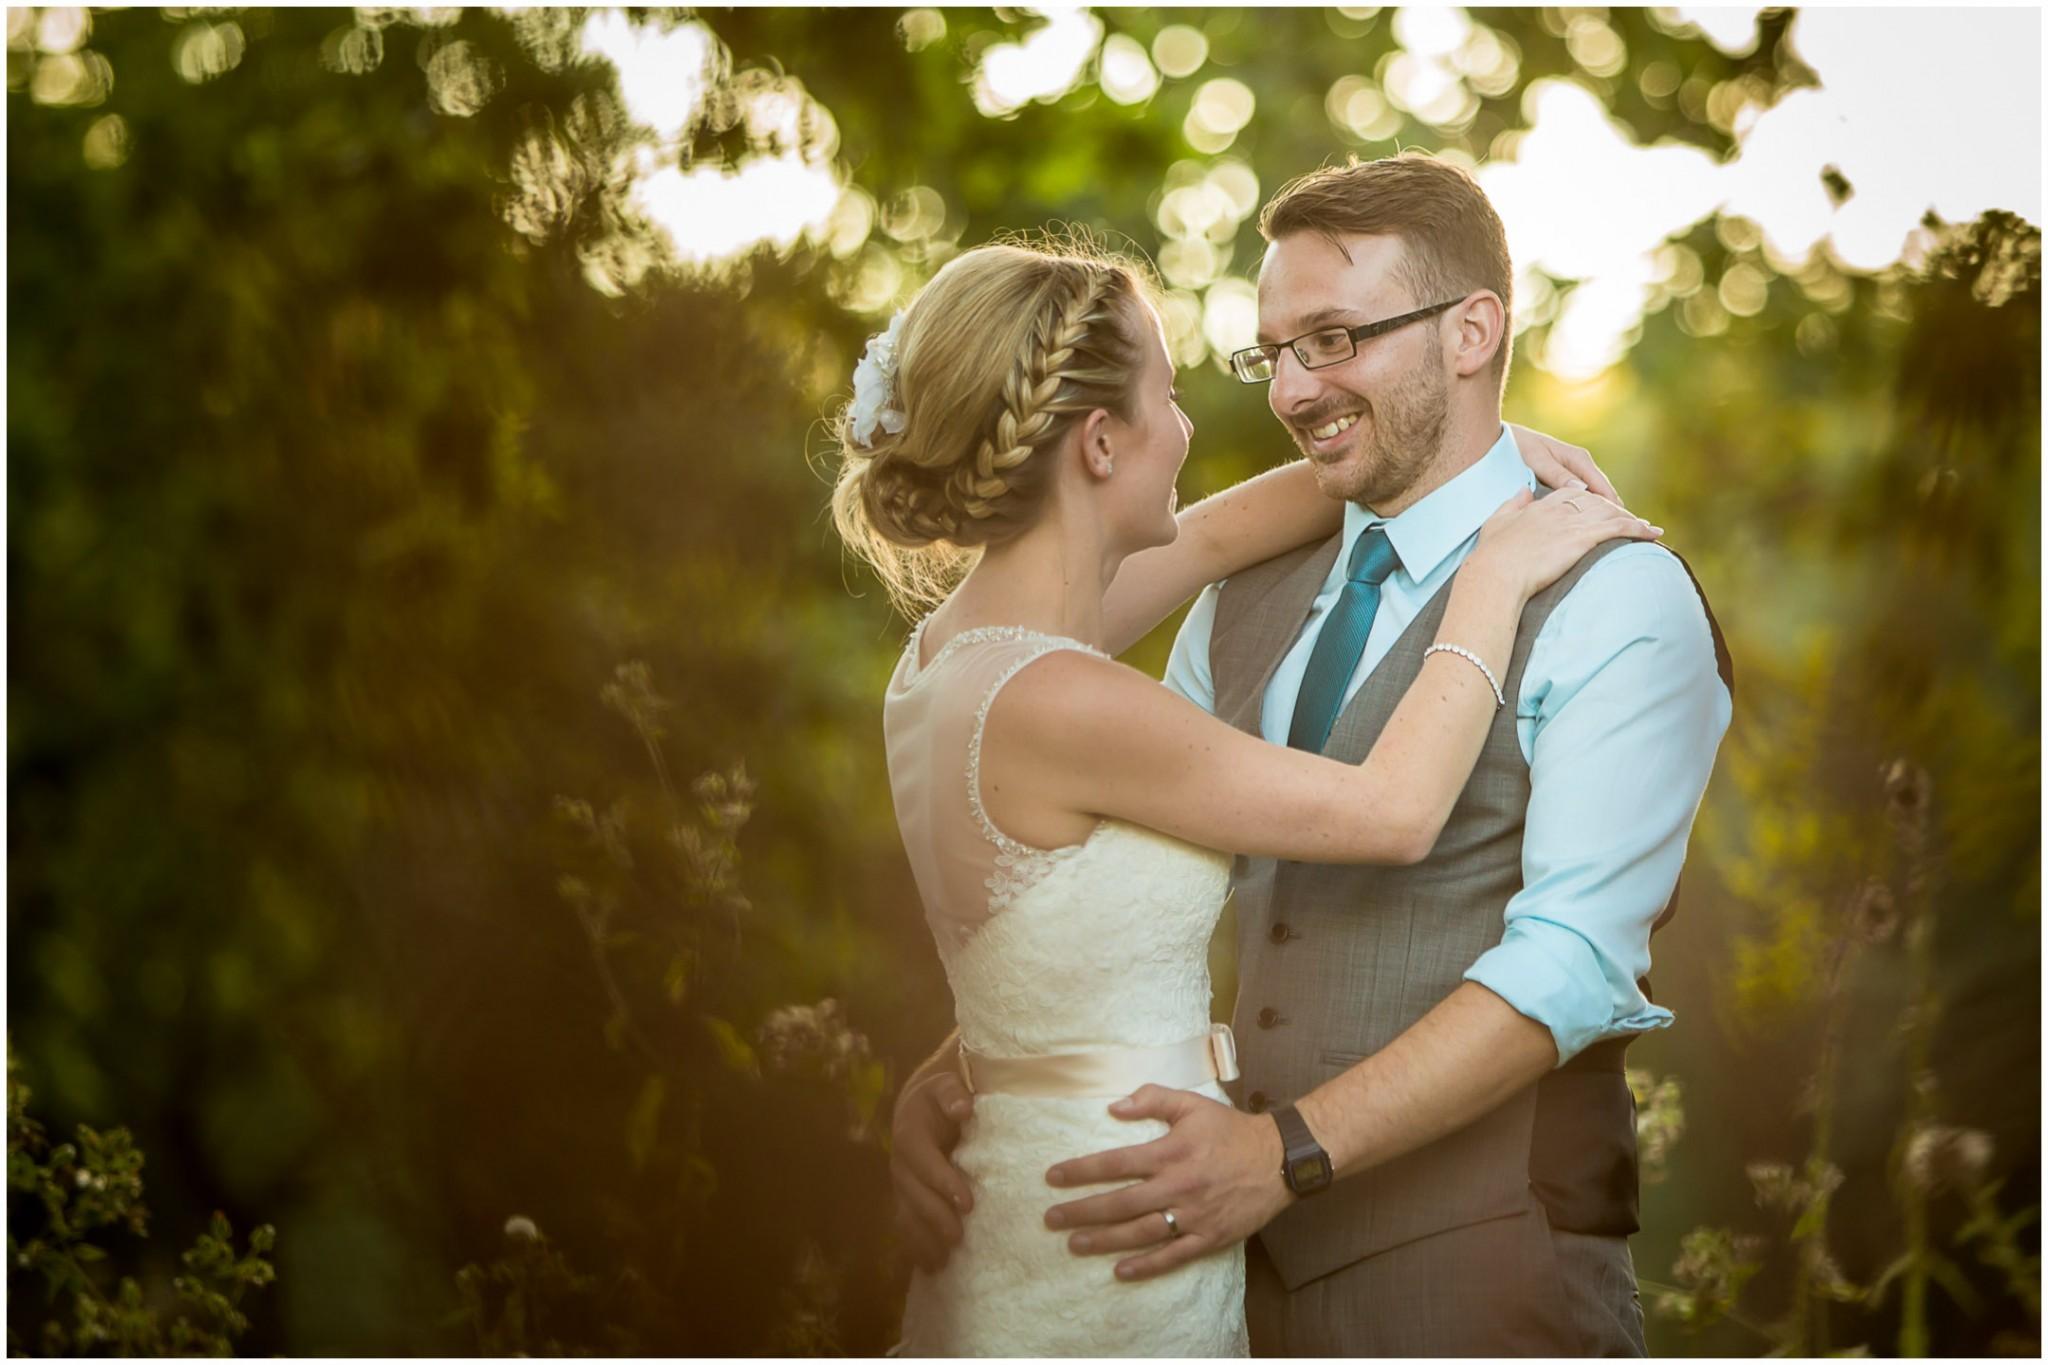 Tournerbury Woods Estate Wedding Bride & Groom in Golden light